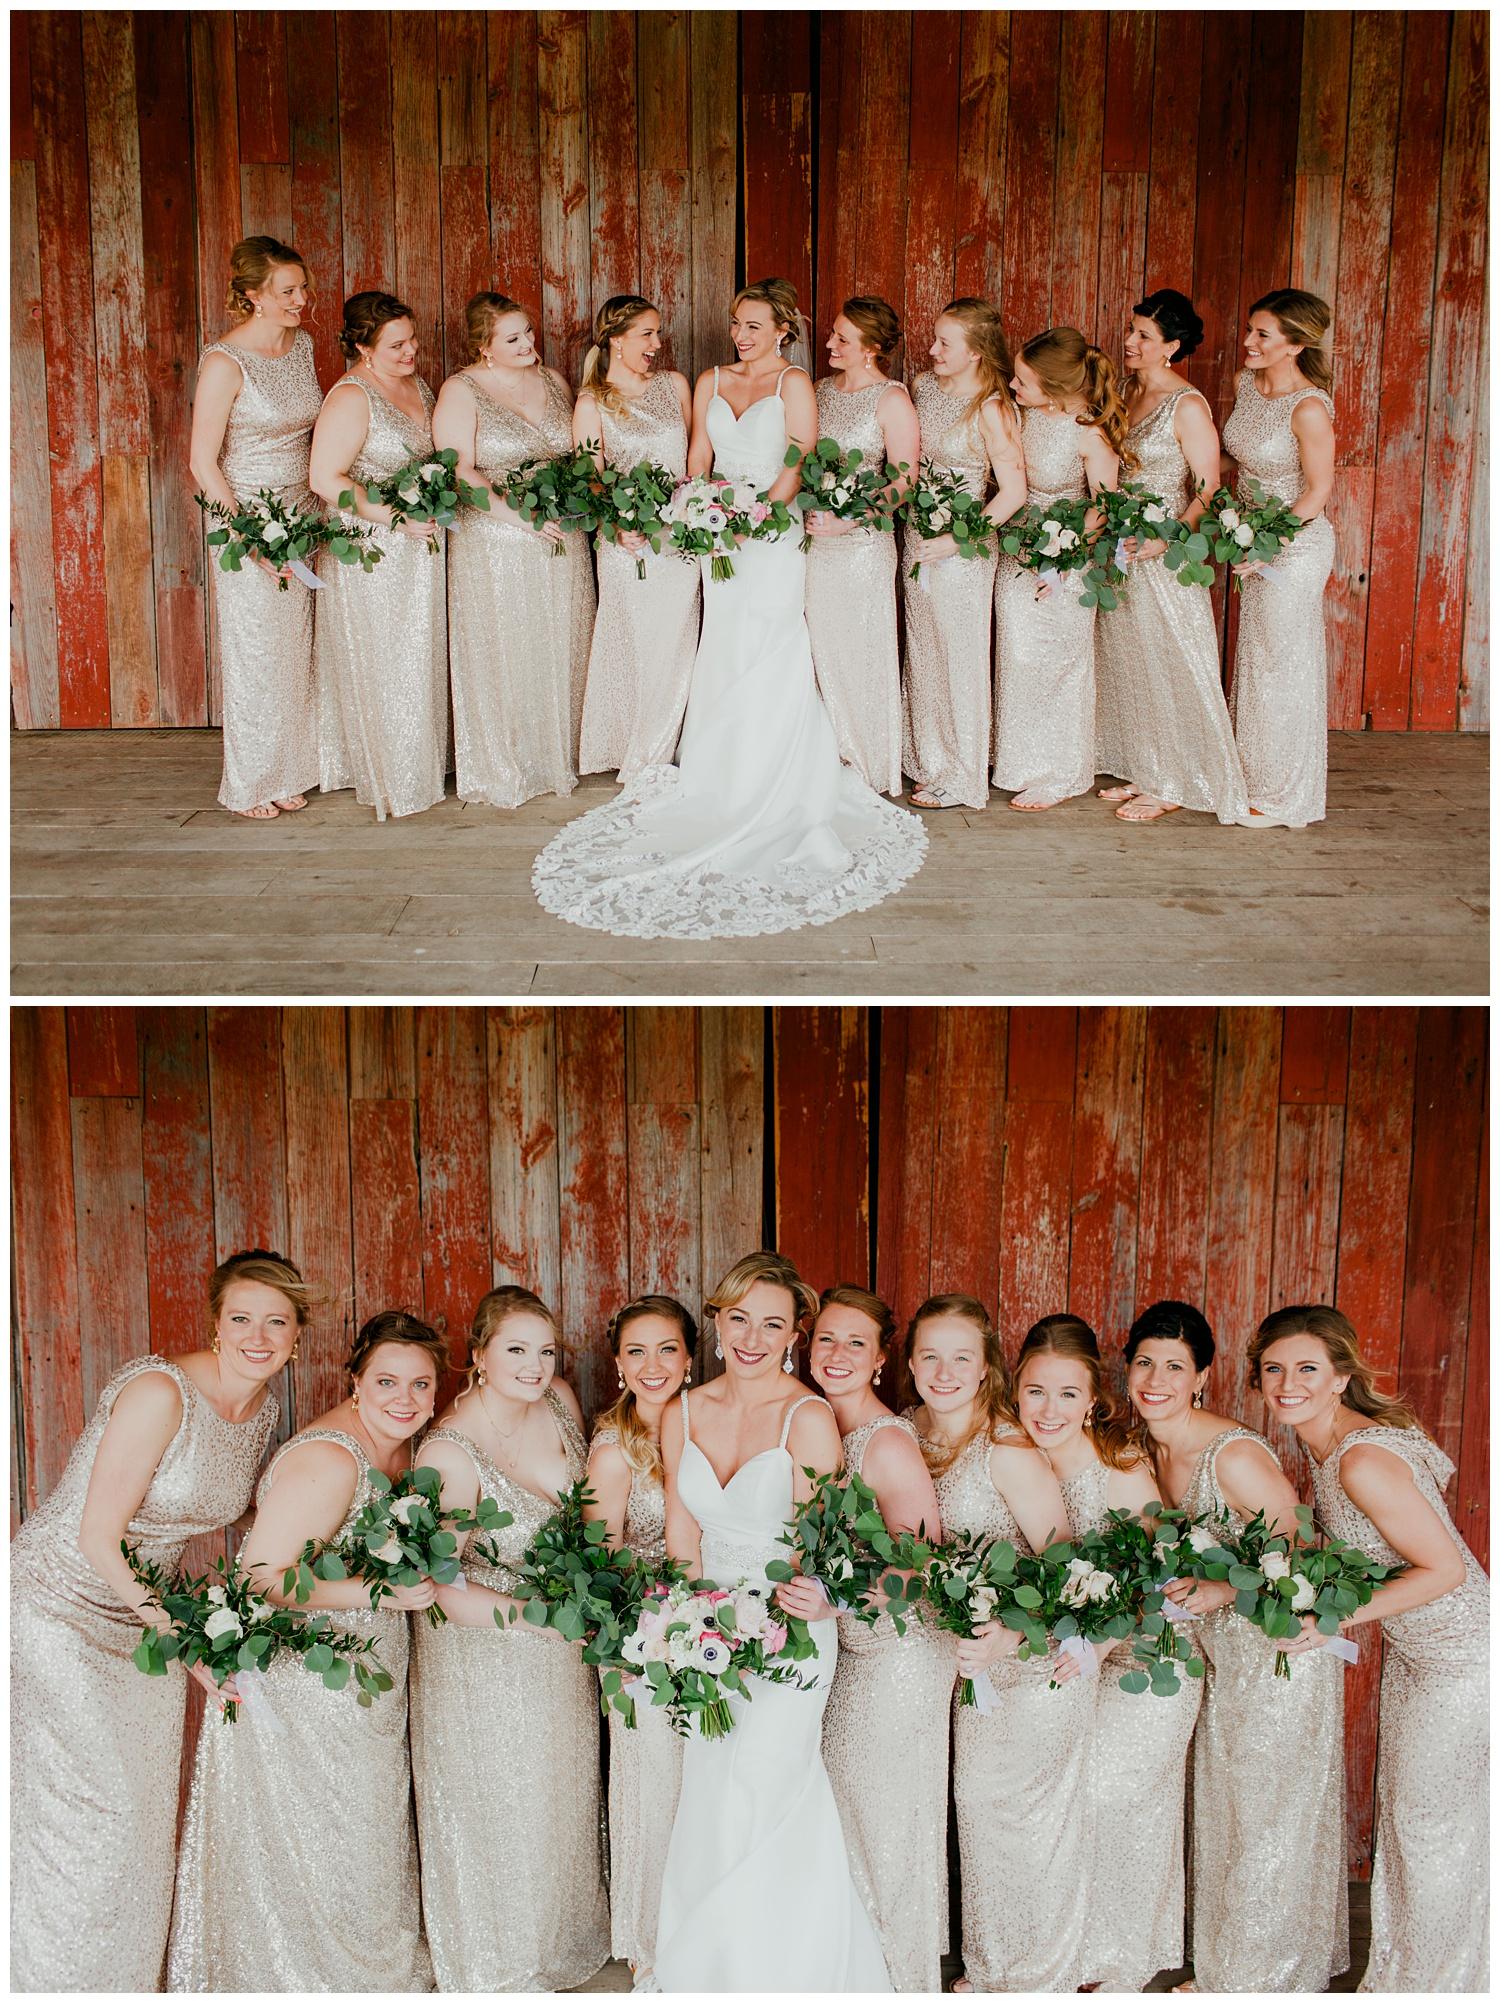 blissfulbarn threeoaks michigan wedding photography journeymandistillery35.jpg